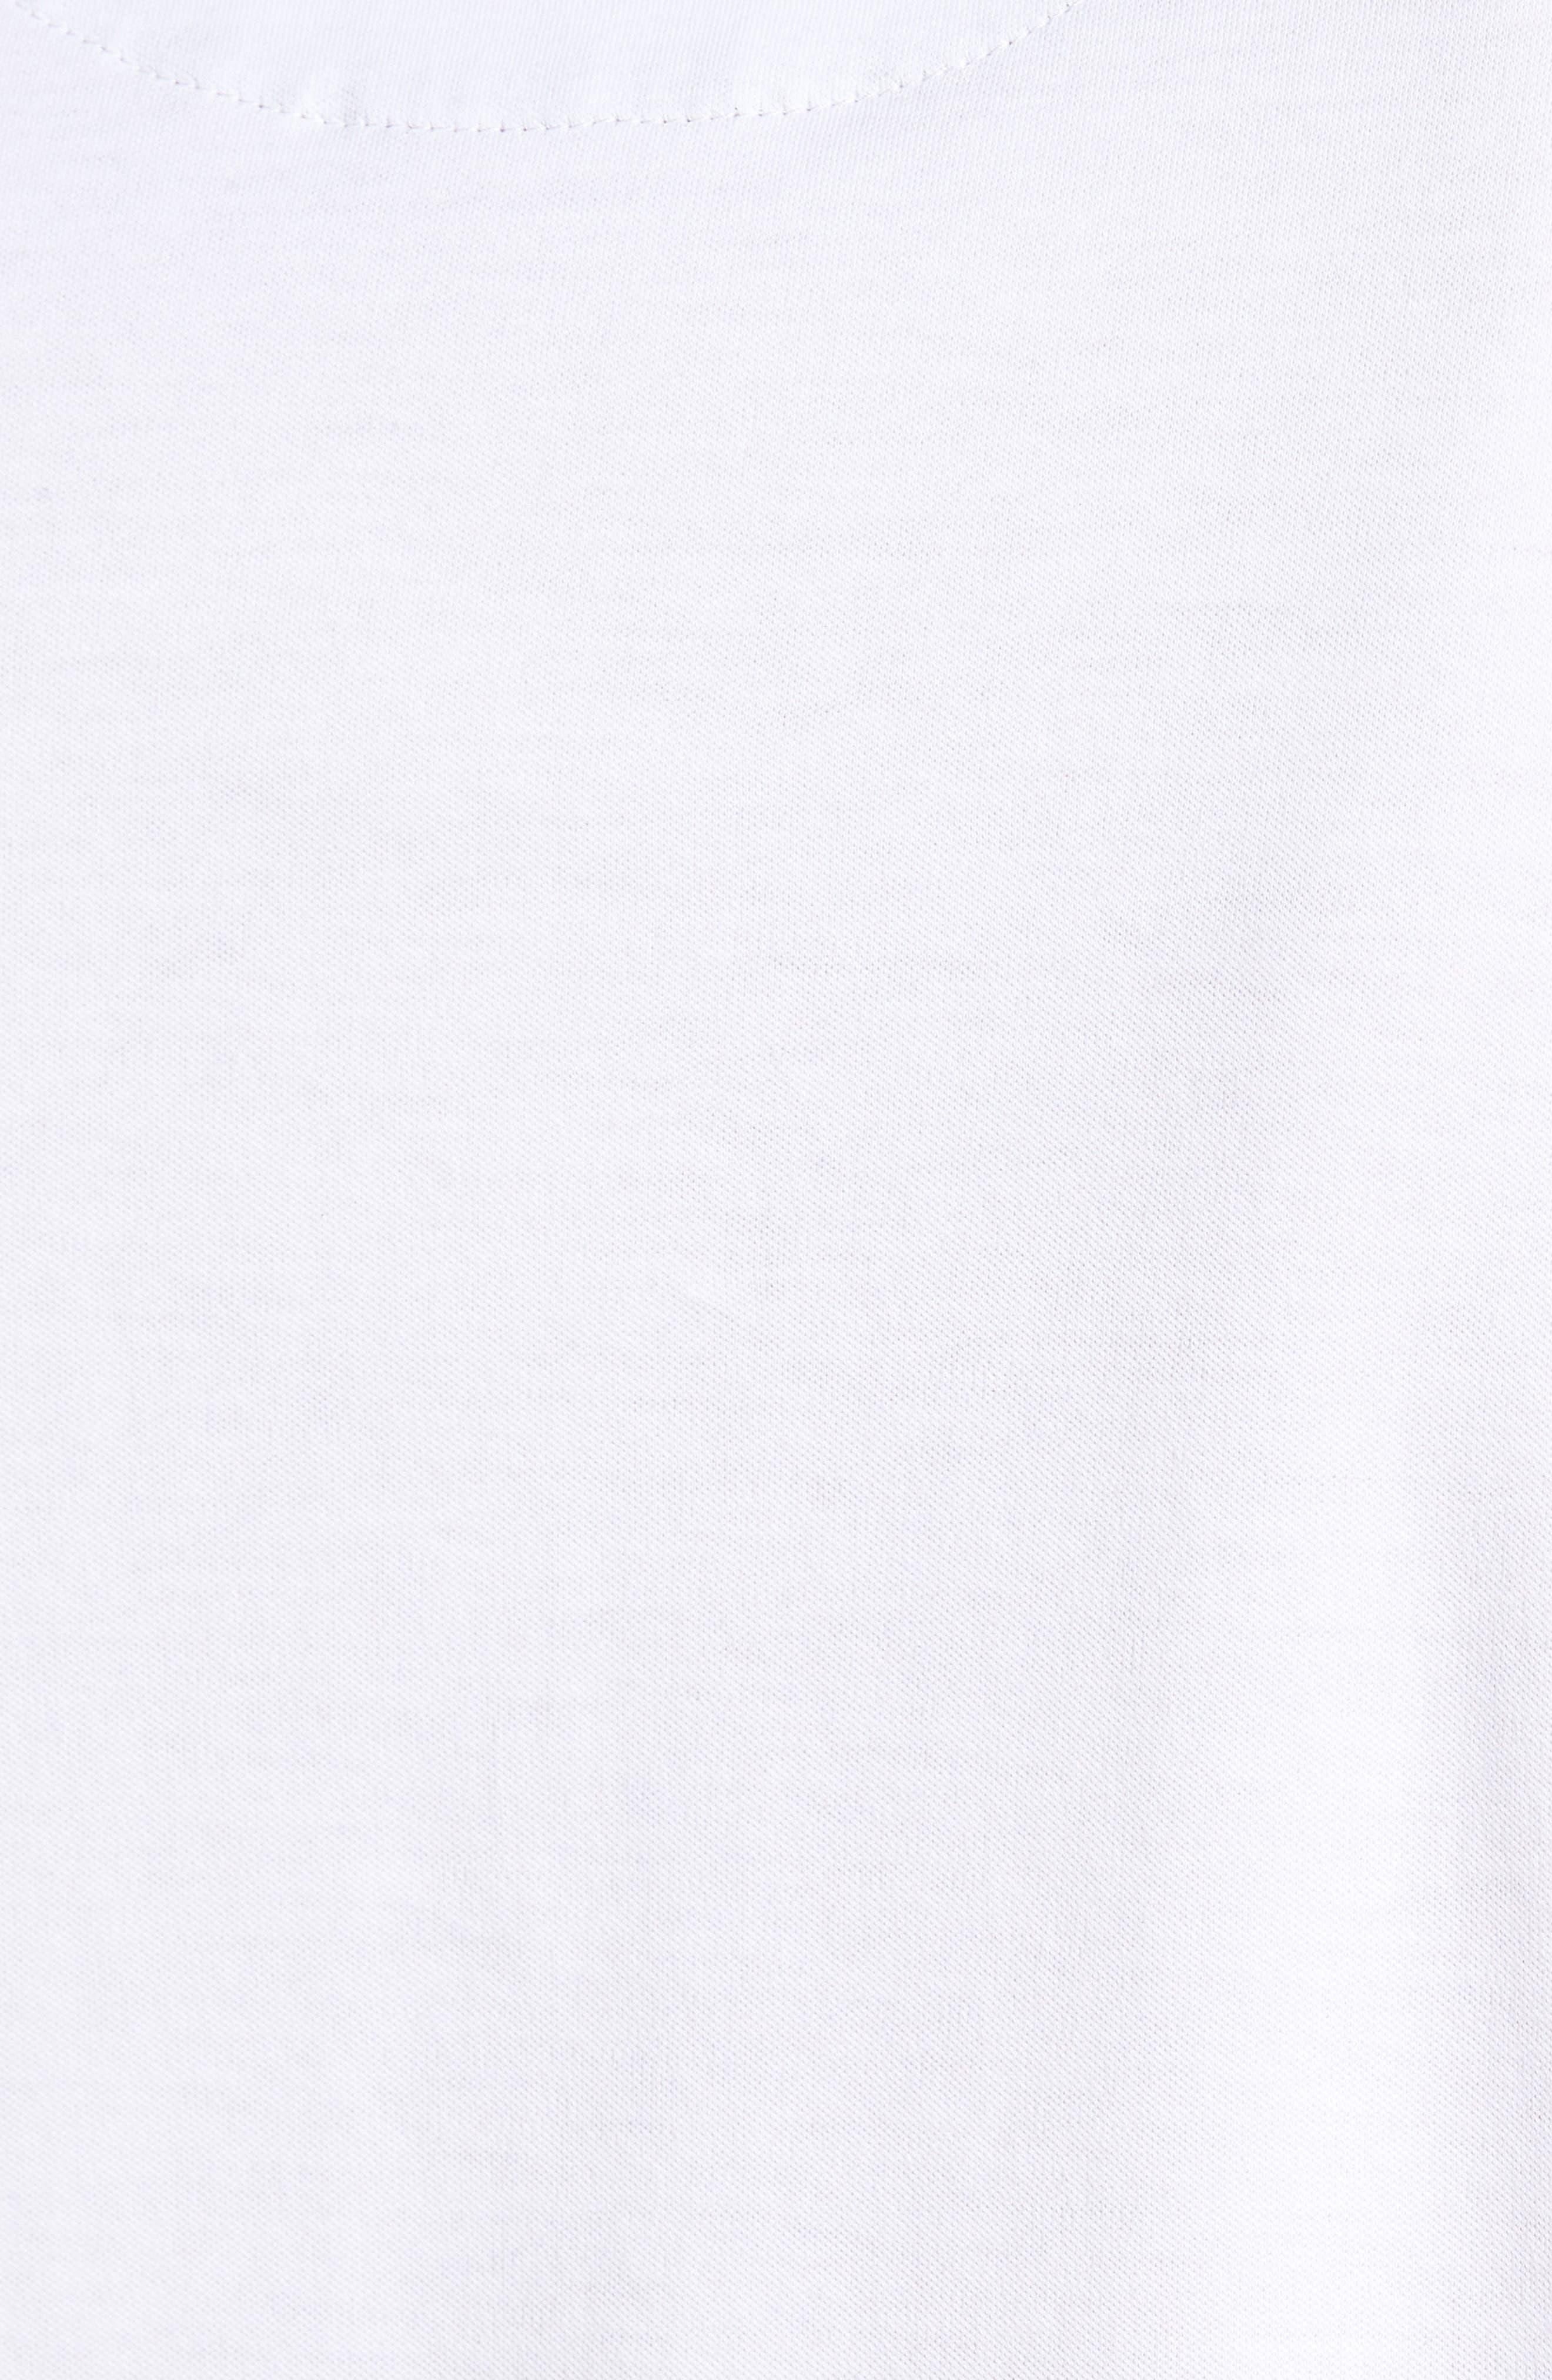 TED BAKER LONDON, Derry Modern Slim Fit Polo, Alternate thumbnail 5, color, WHITE